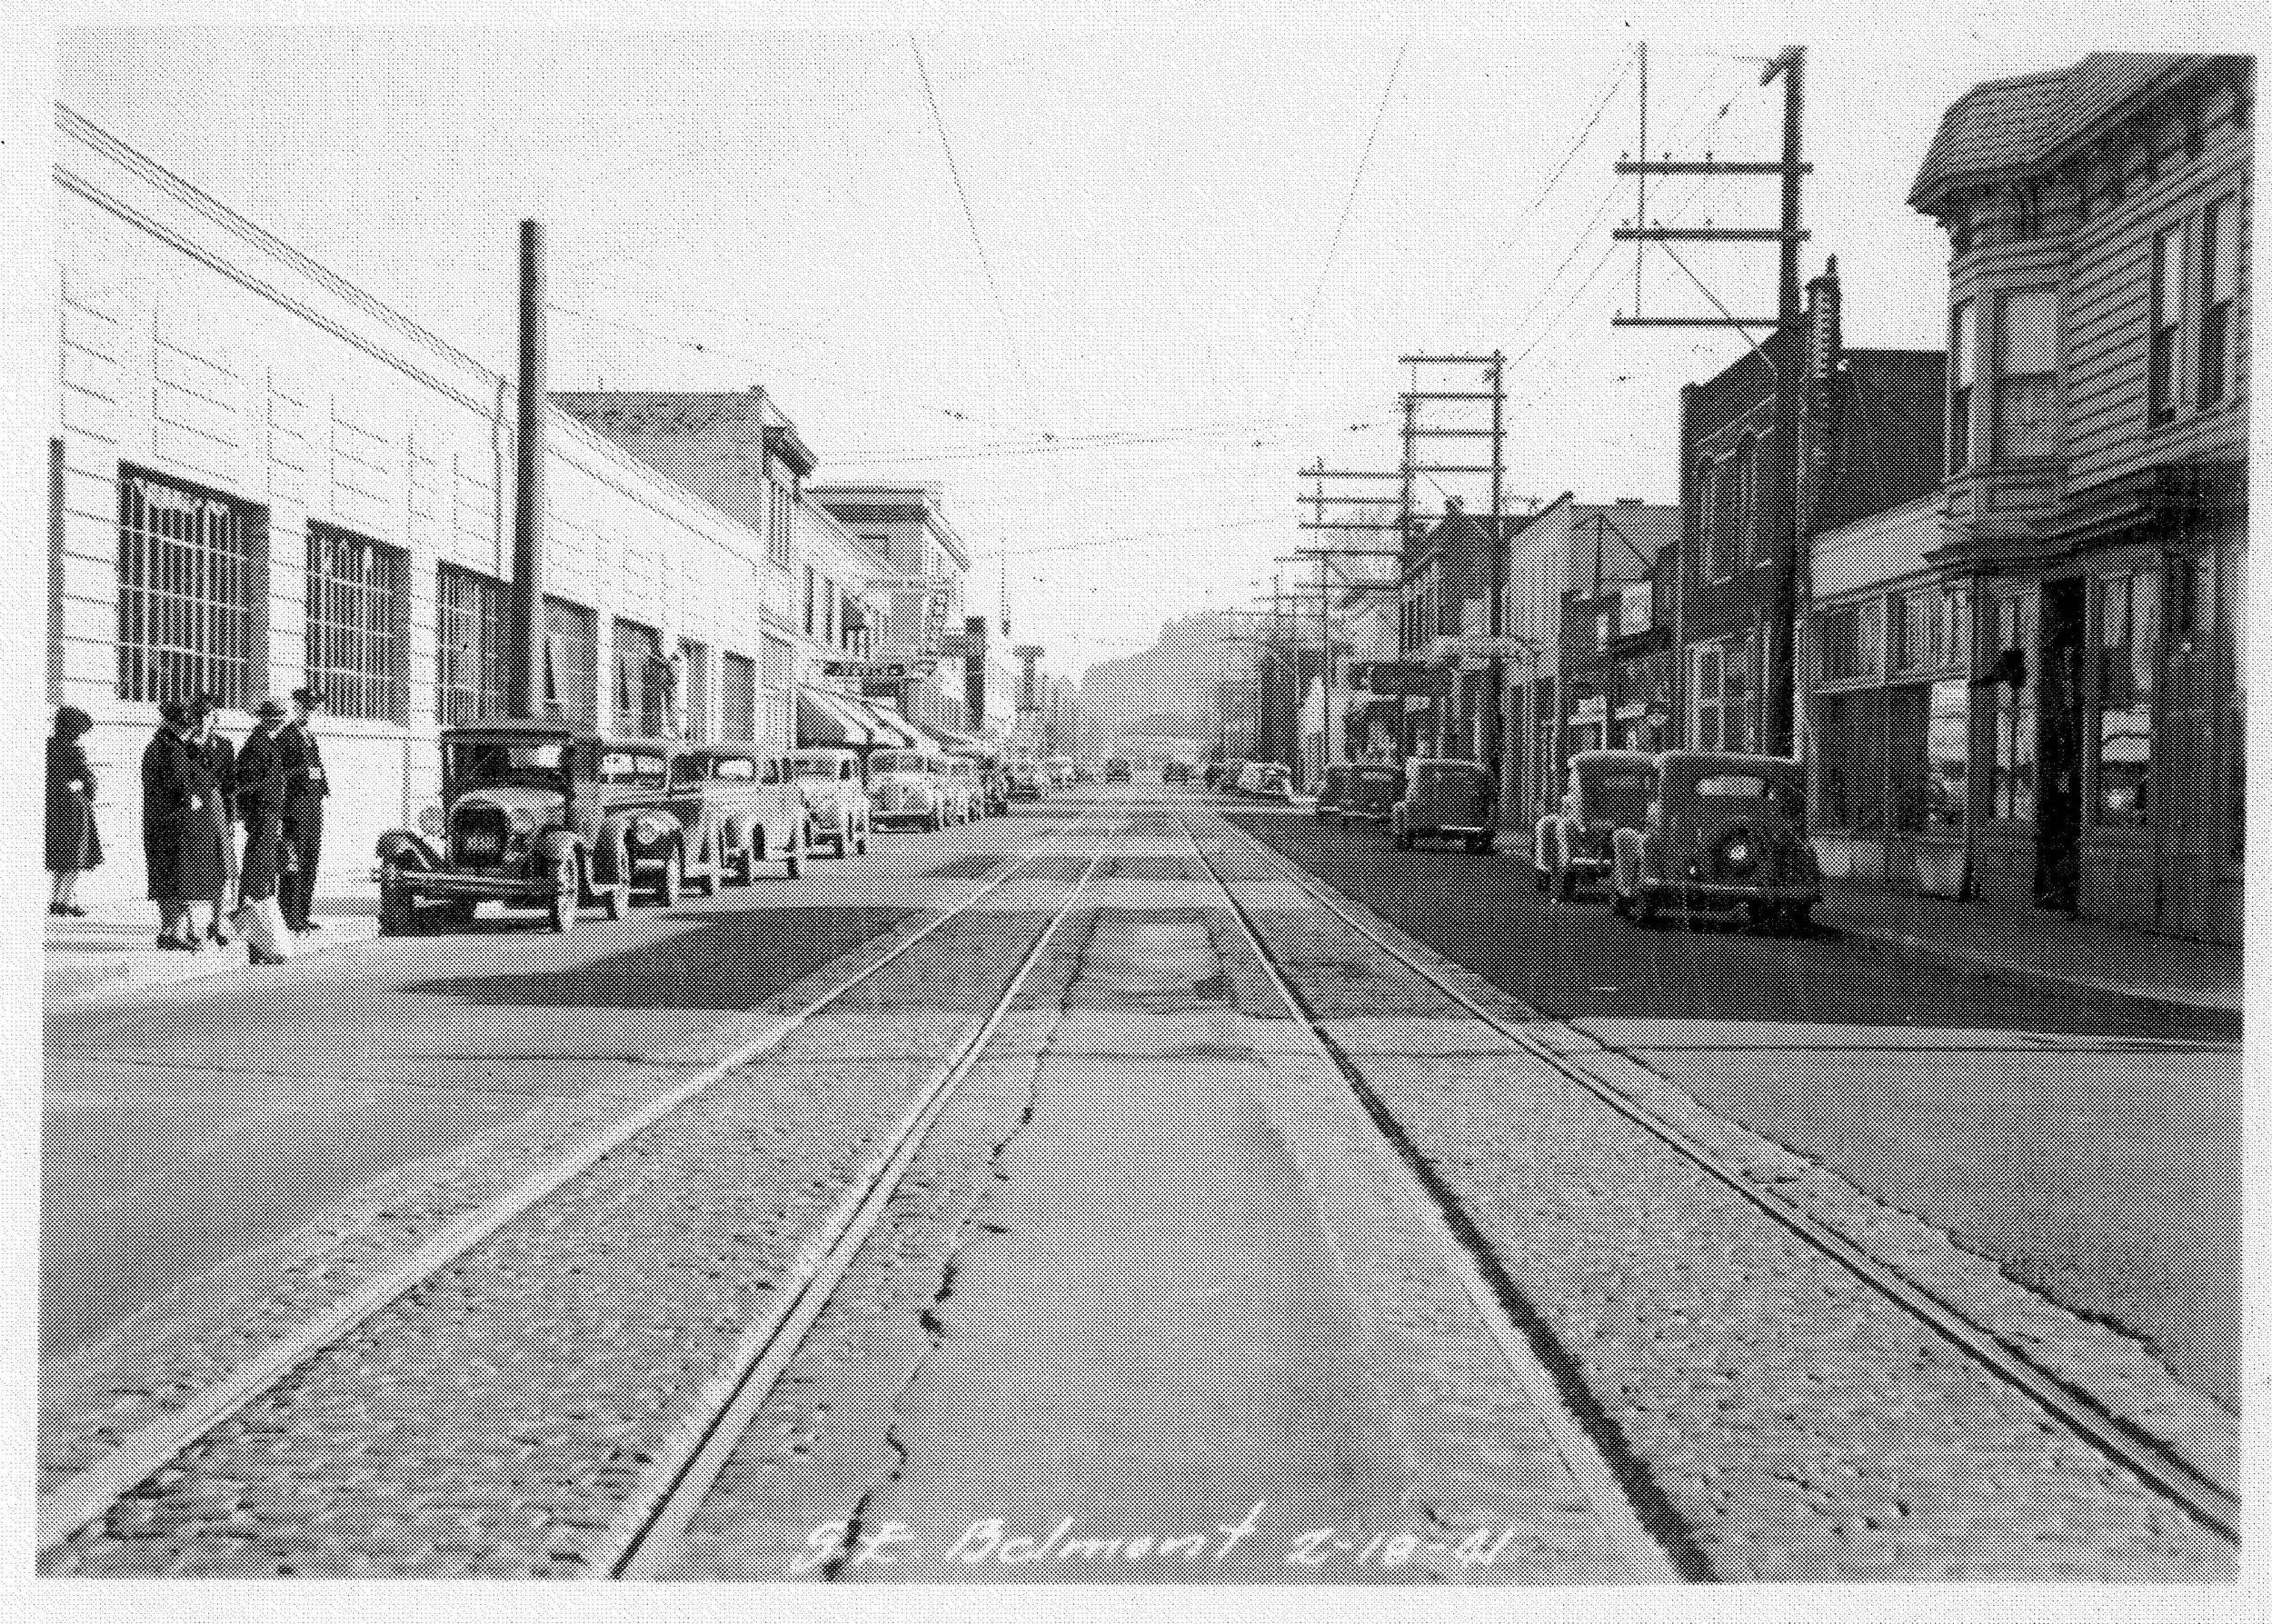 33rd & Belmont, 1941